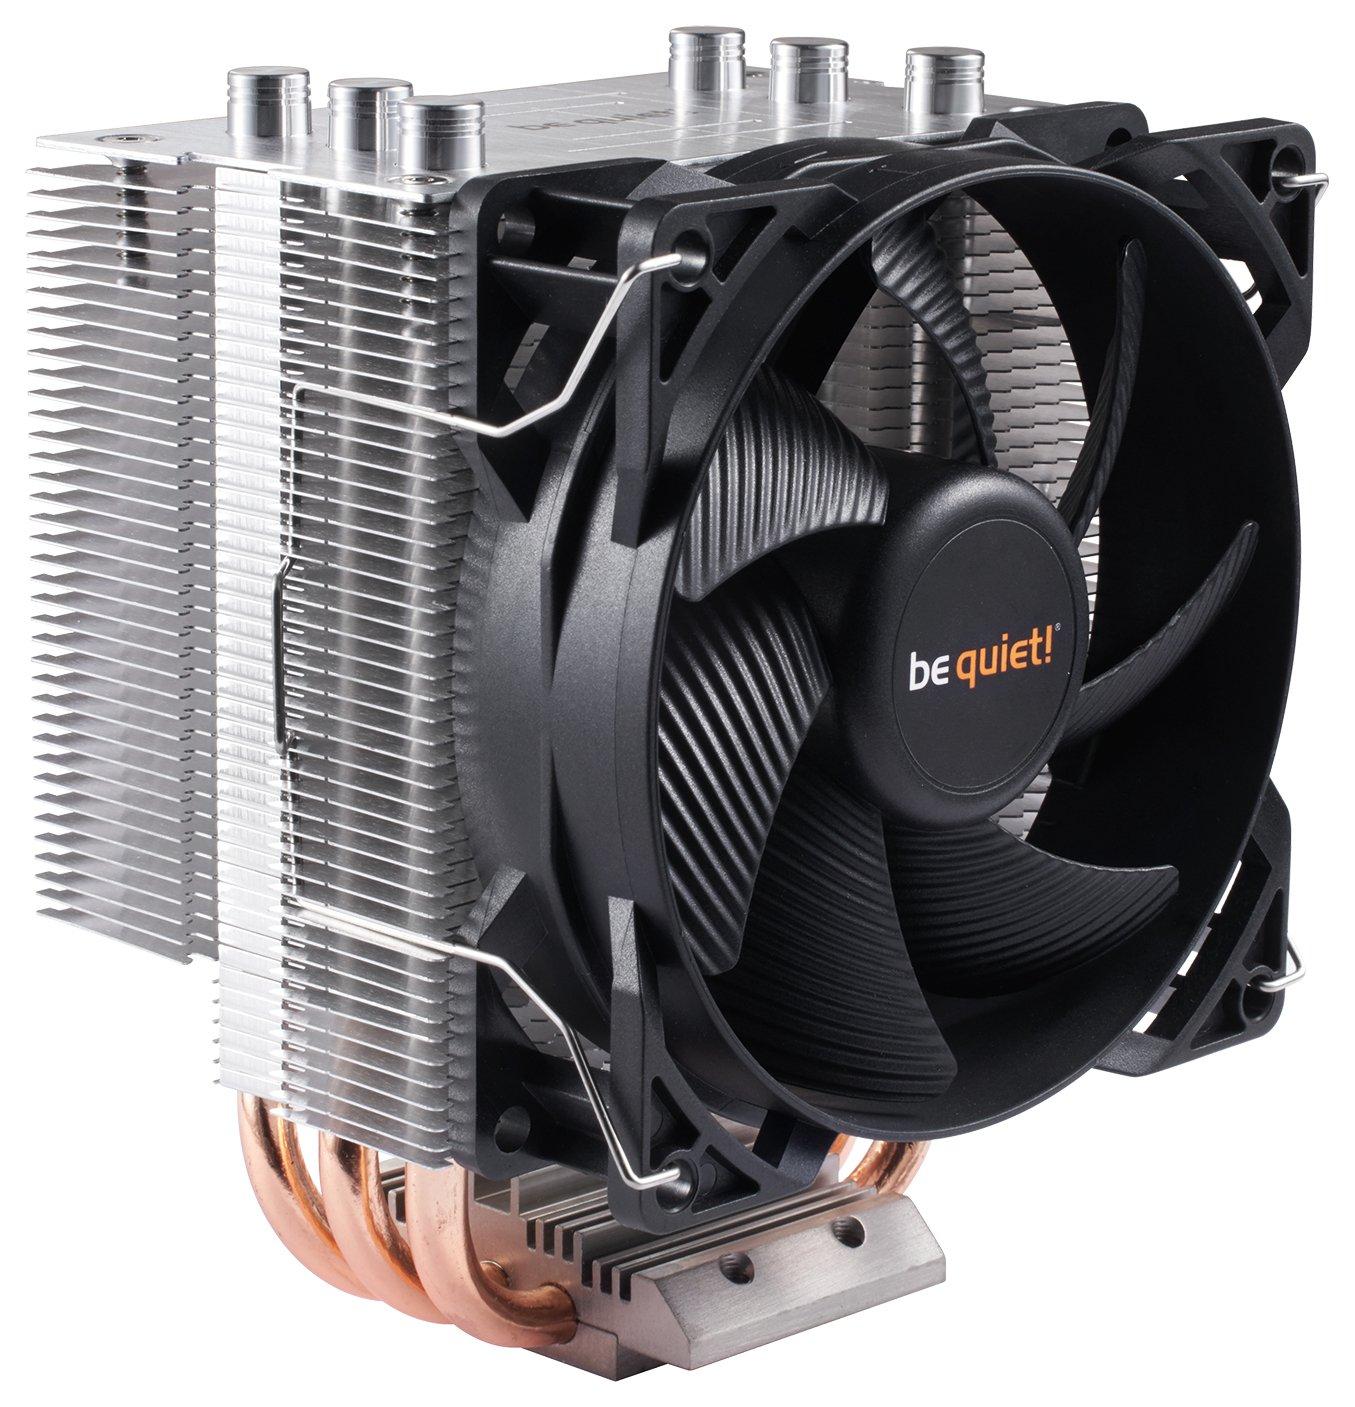 be Quiet! BK008 Pure Rock Slim - CPU Cooler - 120W TDP- Intel 1150 / 1151/ 1155/ 1156 & AMD Socket AM2(+) / AM3(+) / AM4 / FM1 / FM2(+) by be quiet!